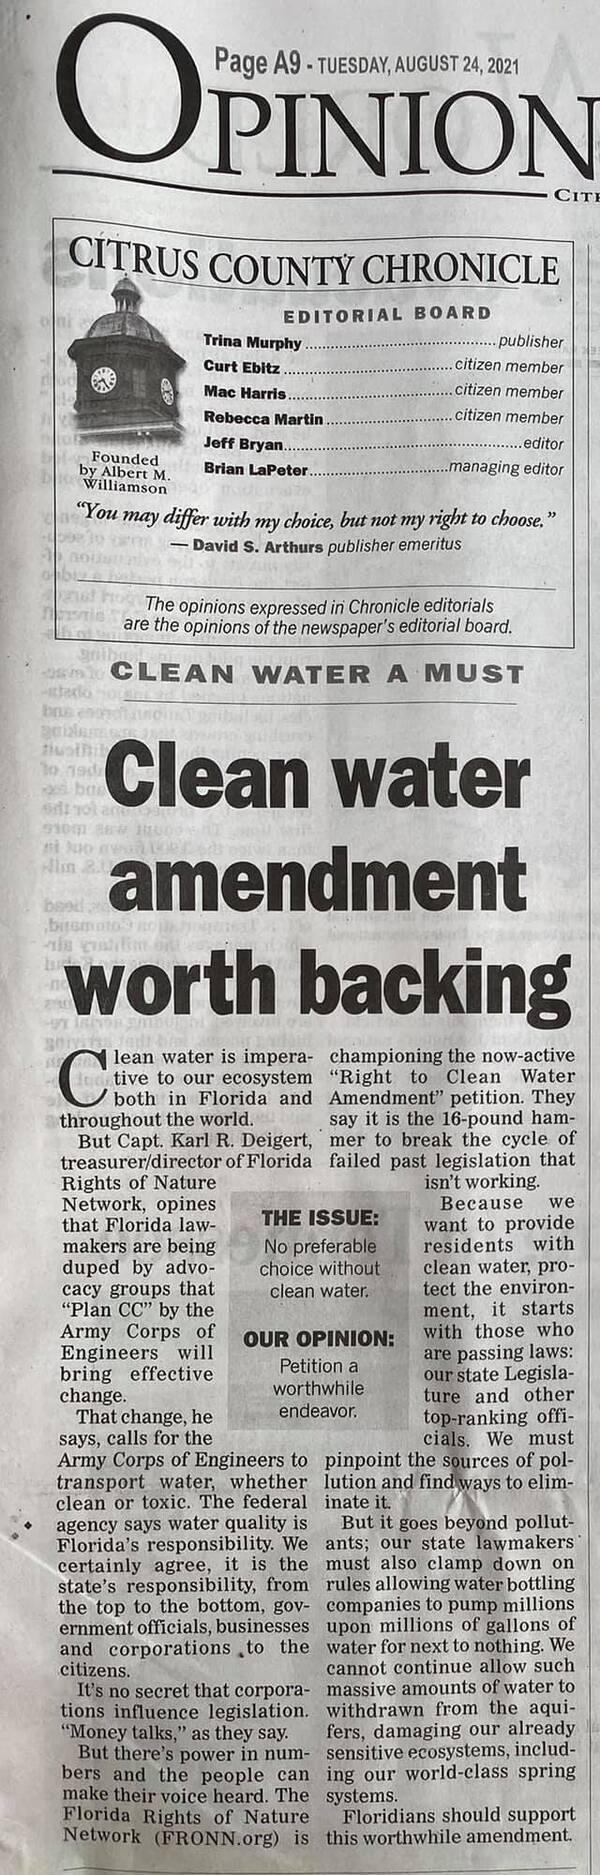 [Clean water amendment worth backing]